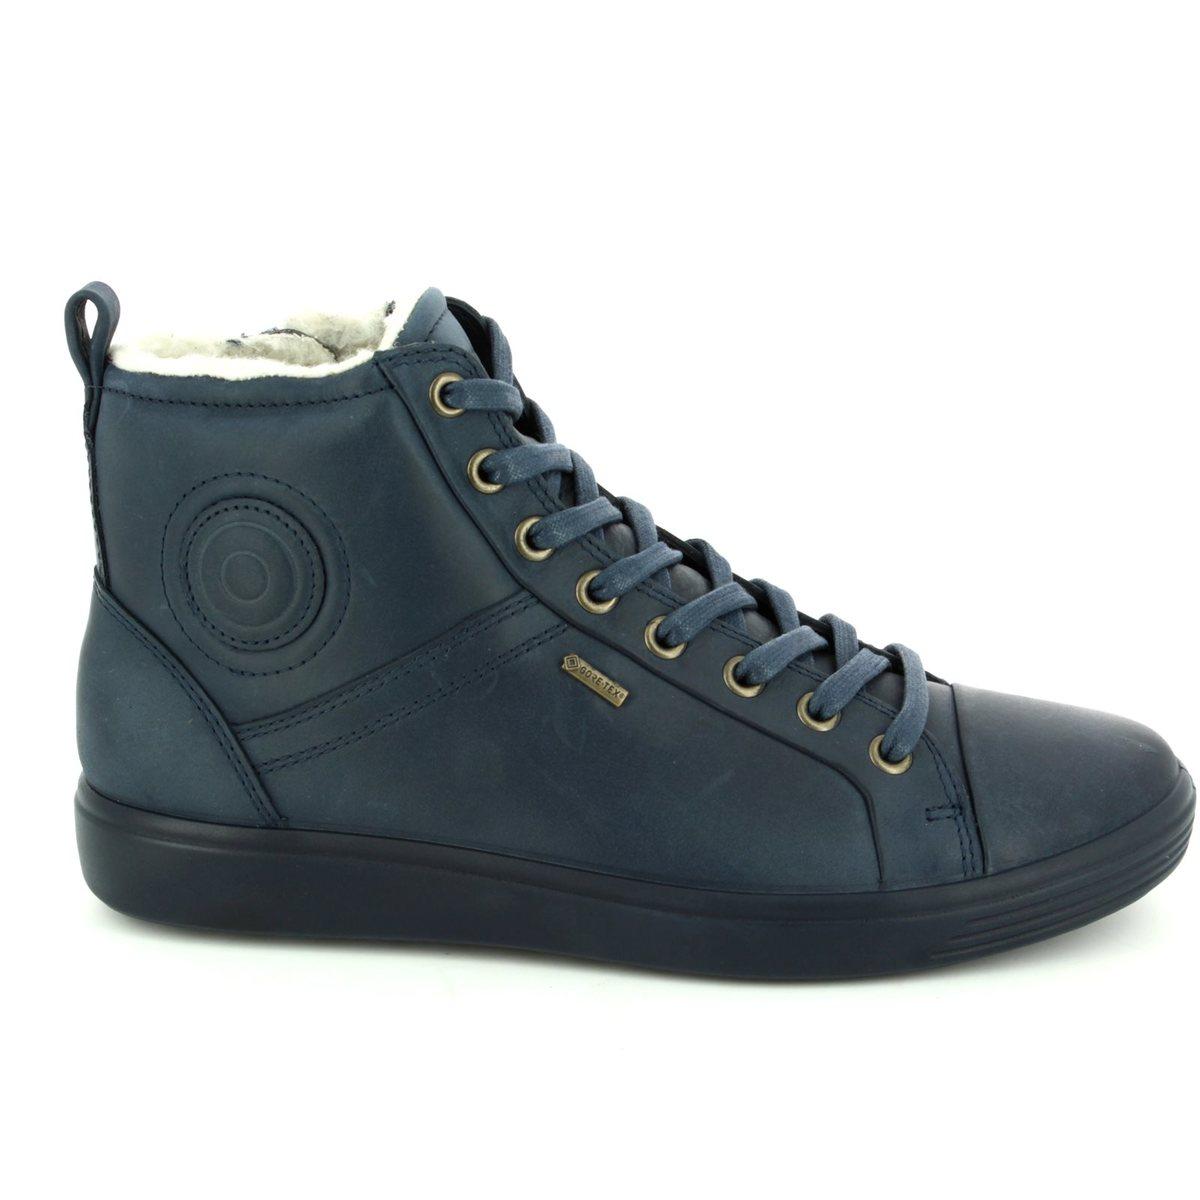 Ecco Ladies Gore Tex Walking Shoes